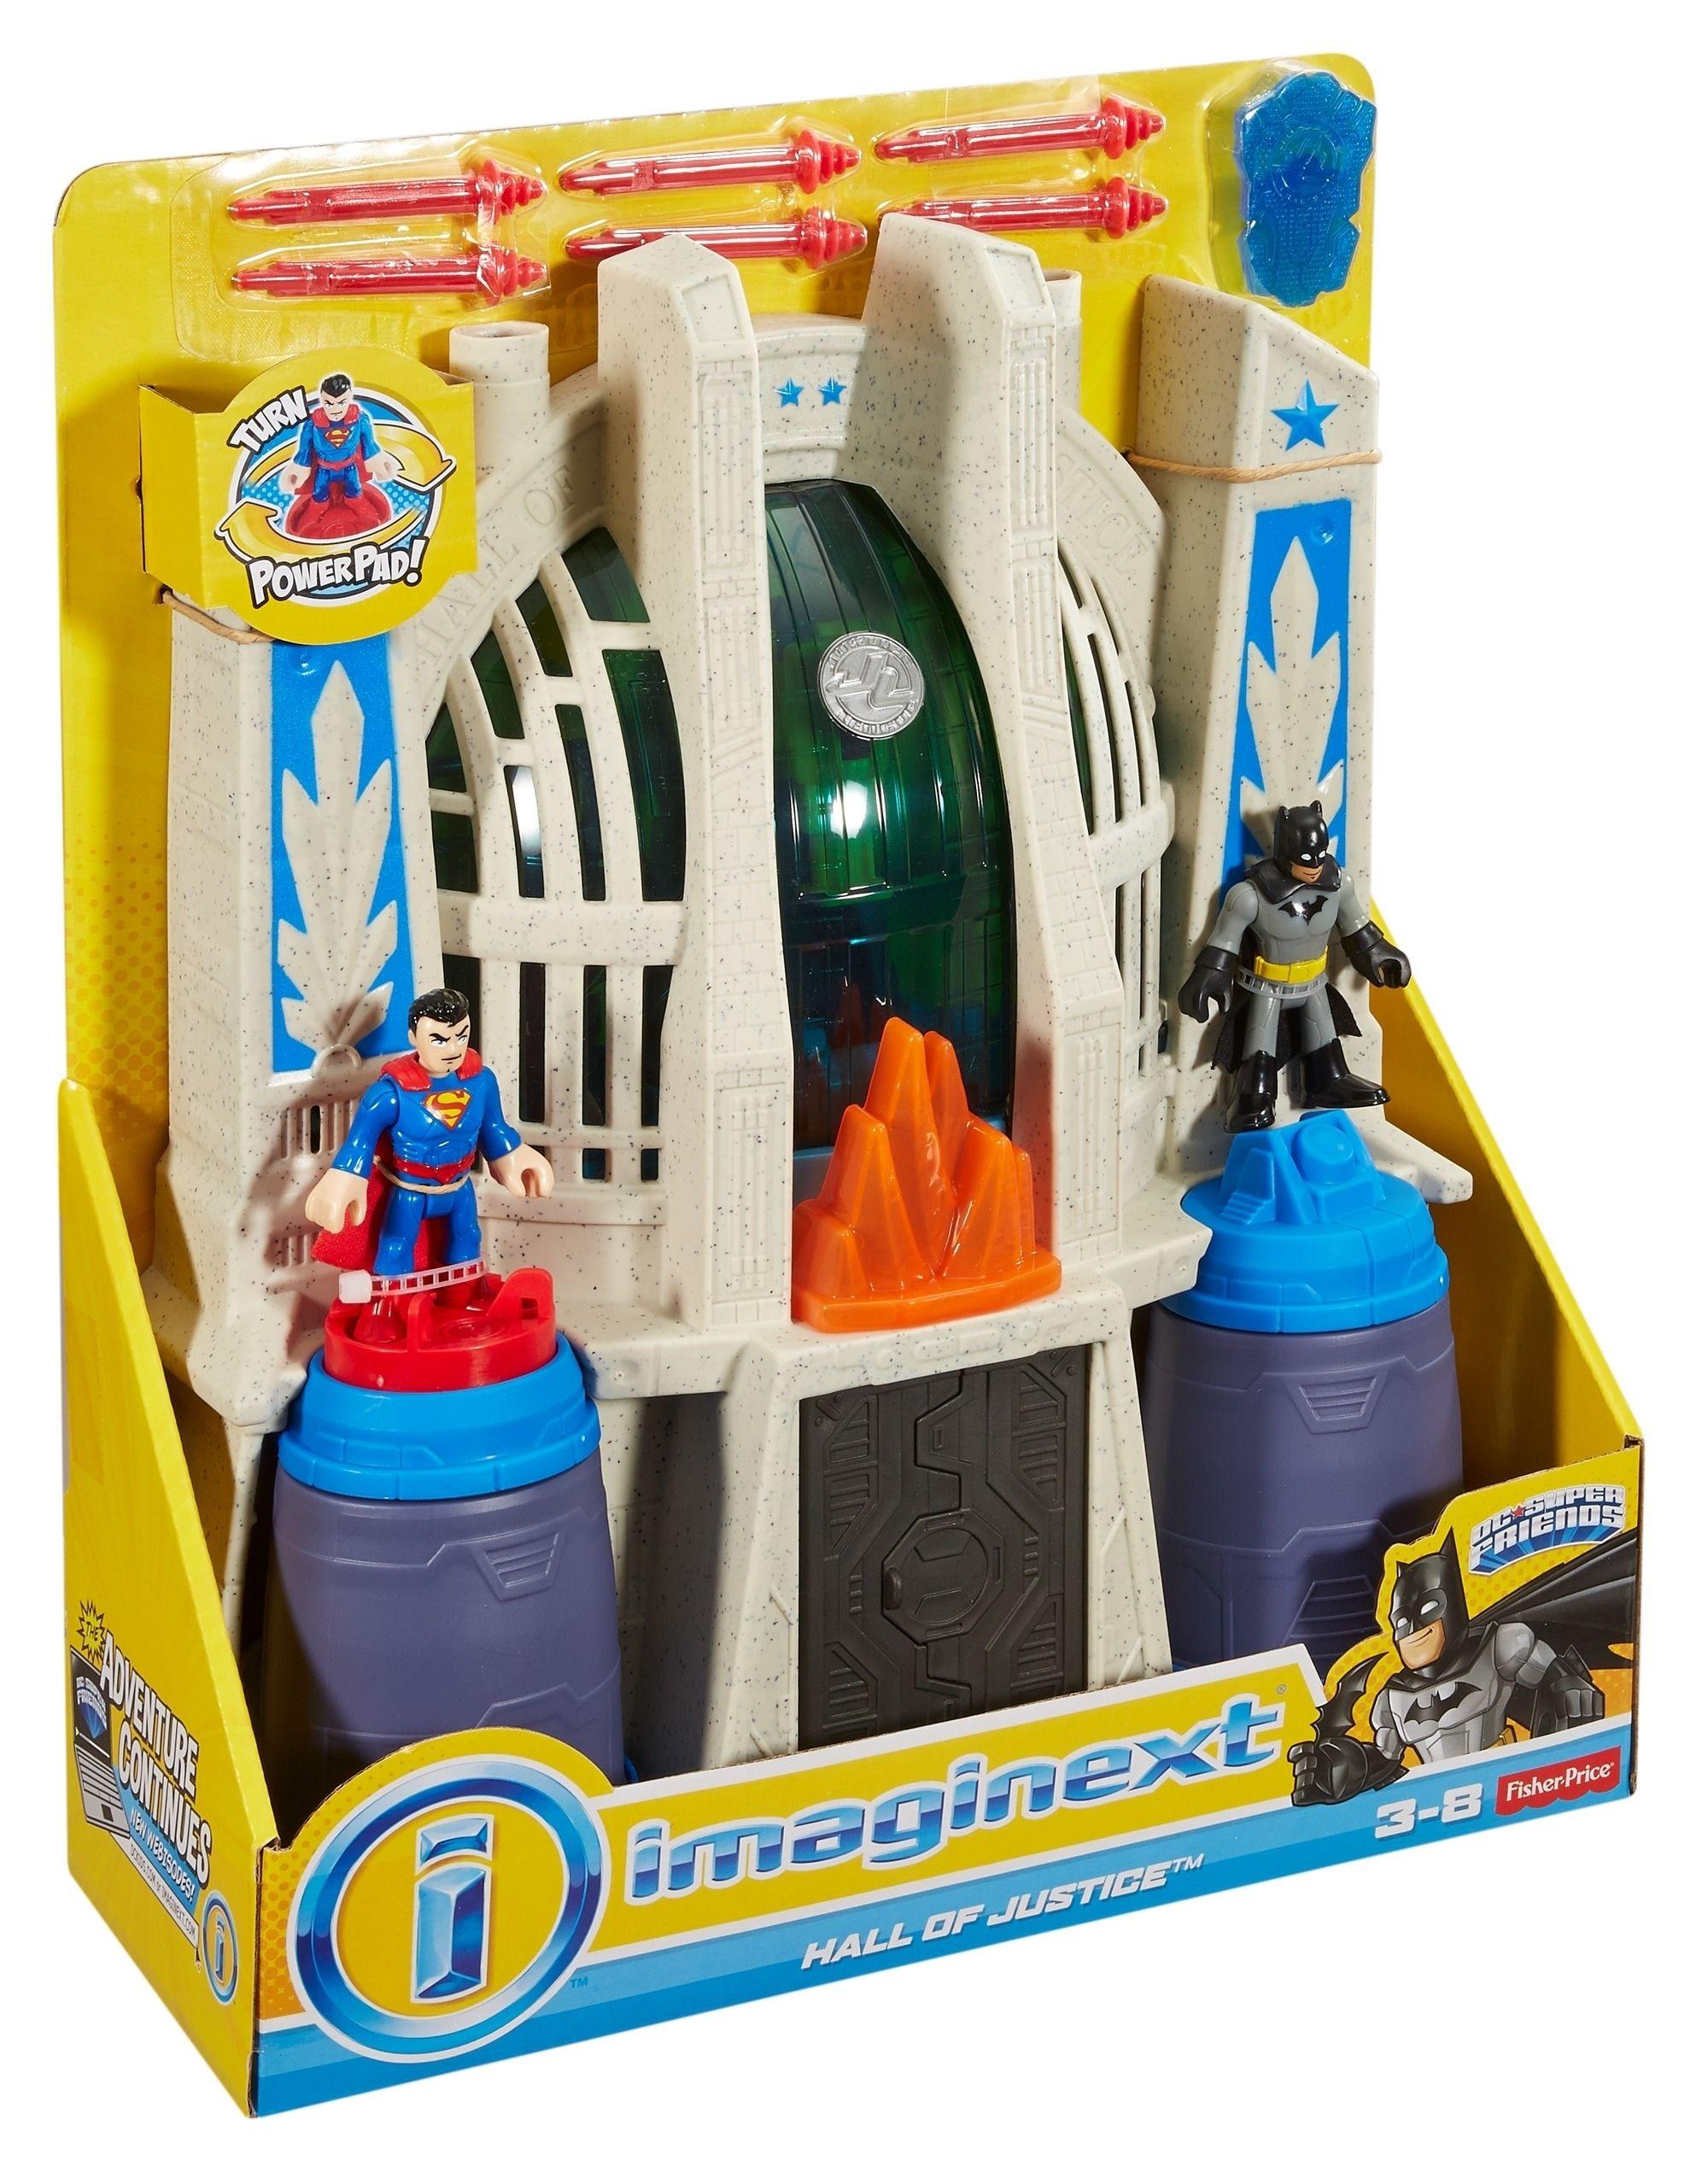 FISHER PRICE IMAGINEXT DC SUPER FRIENDS SALA DE JUSTICIA